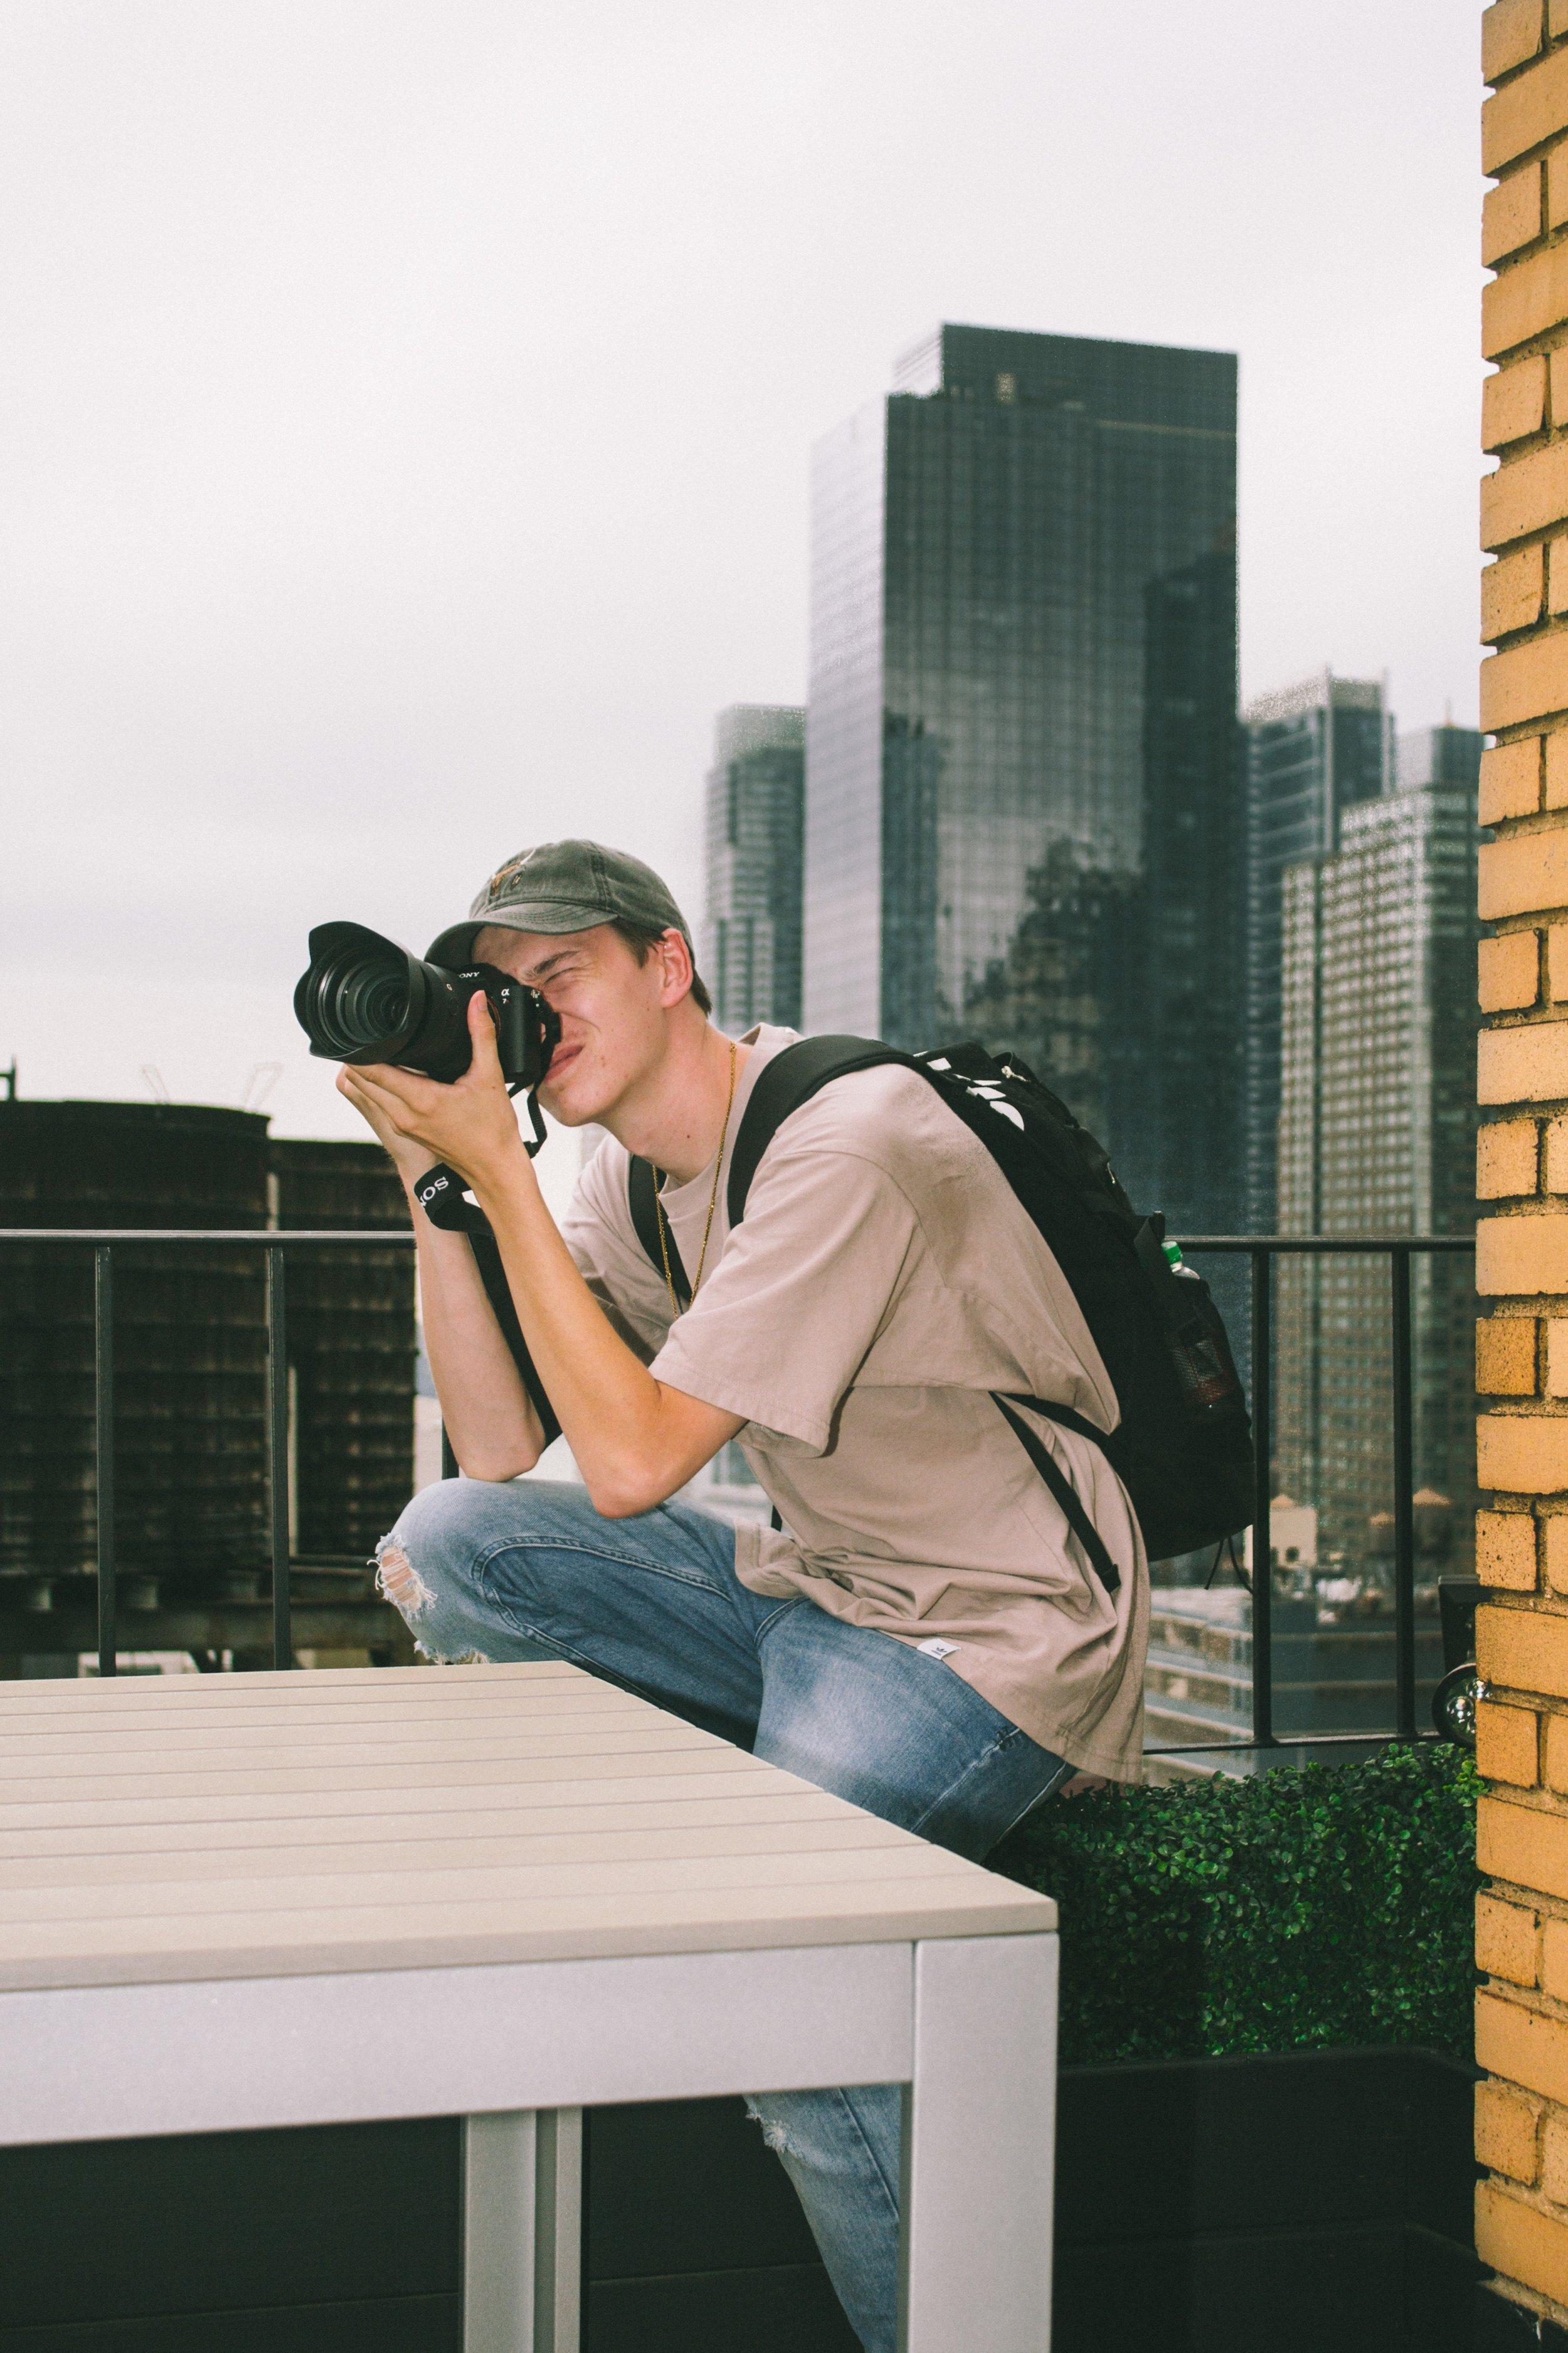 DYLAN BLACKBURN   PHOTOGRAPHER - PORTRAIT